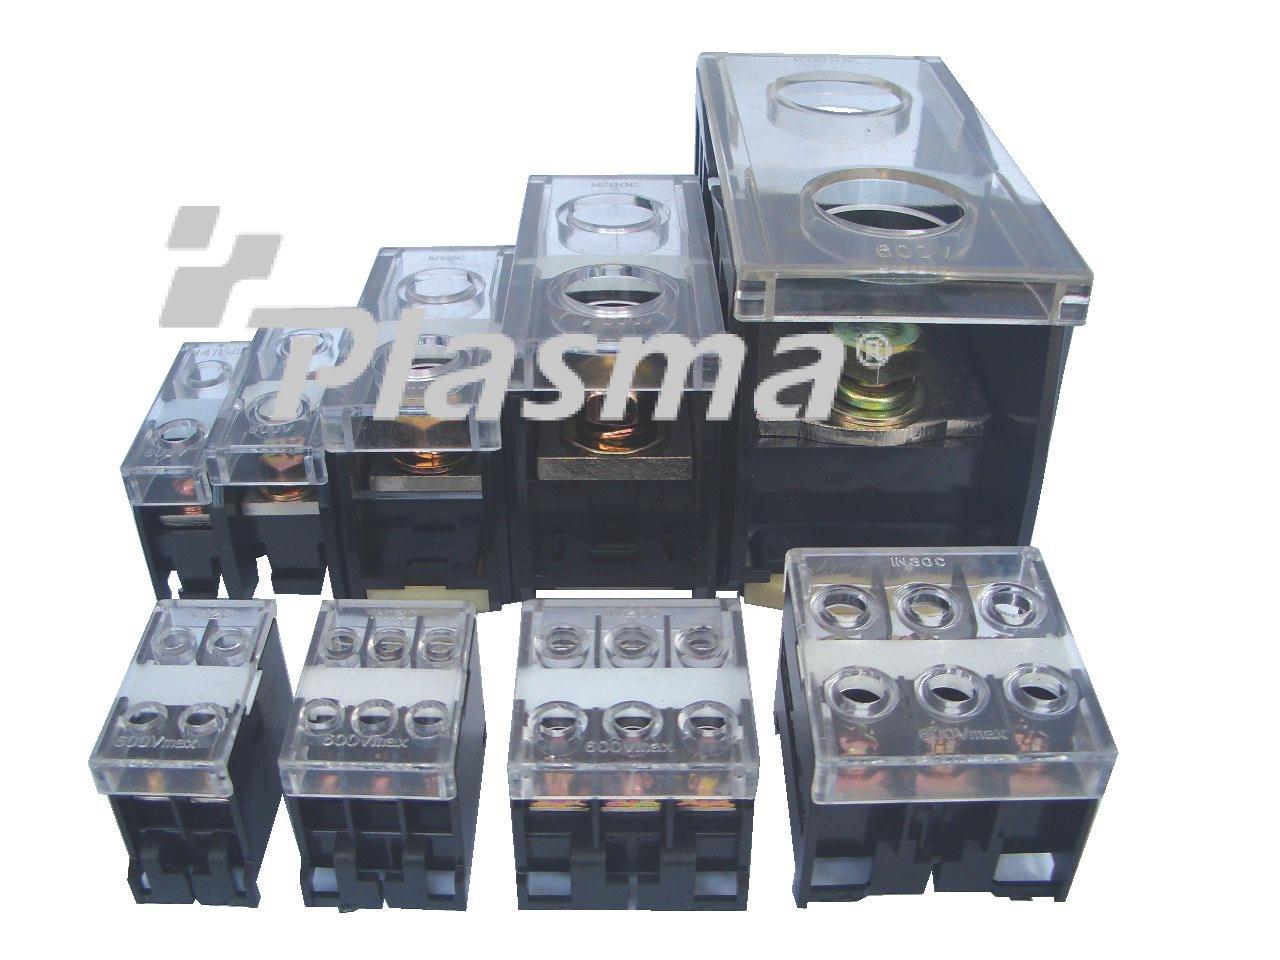 Plasma Electric » TERMINAL BLOCK # DIN RAIL TYPE